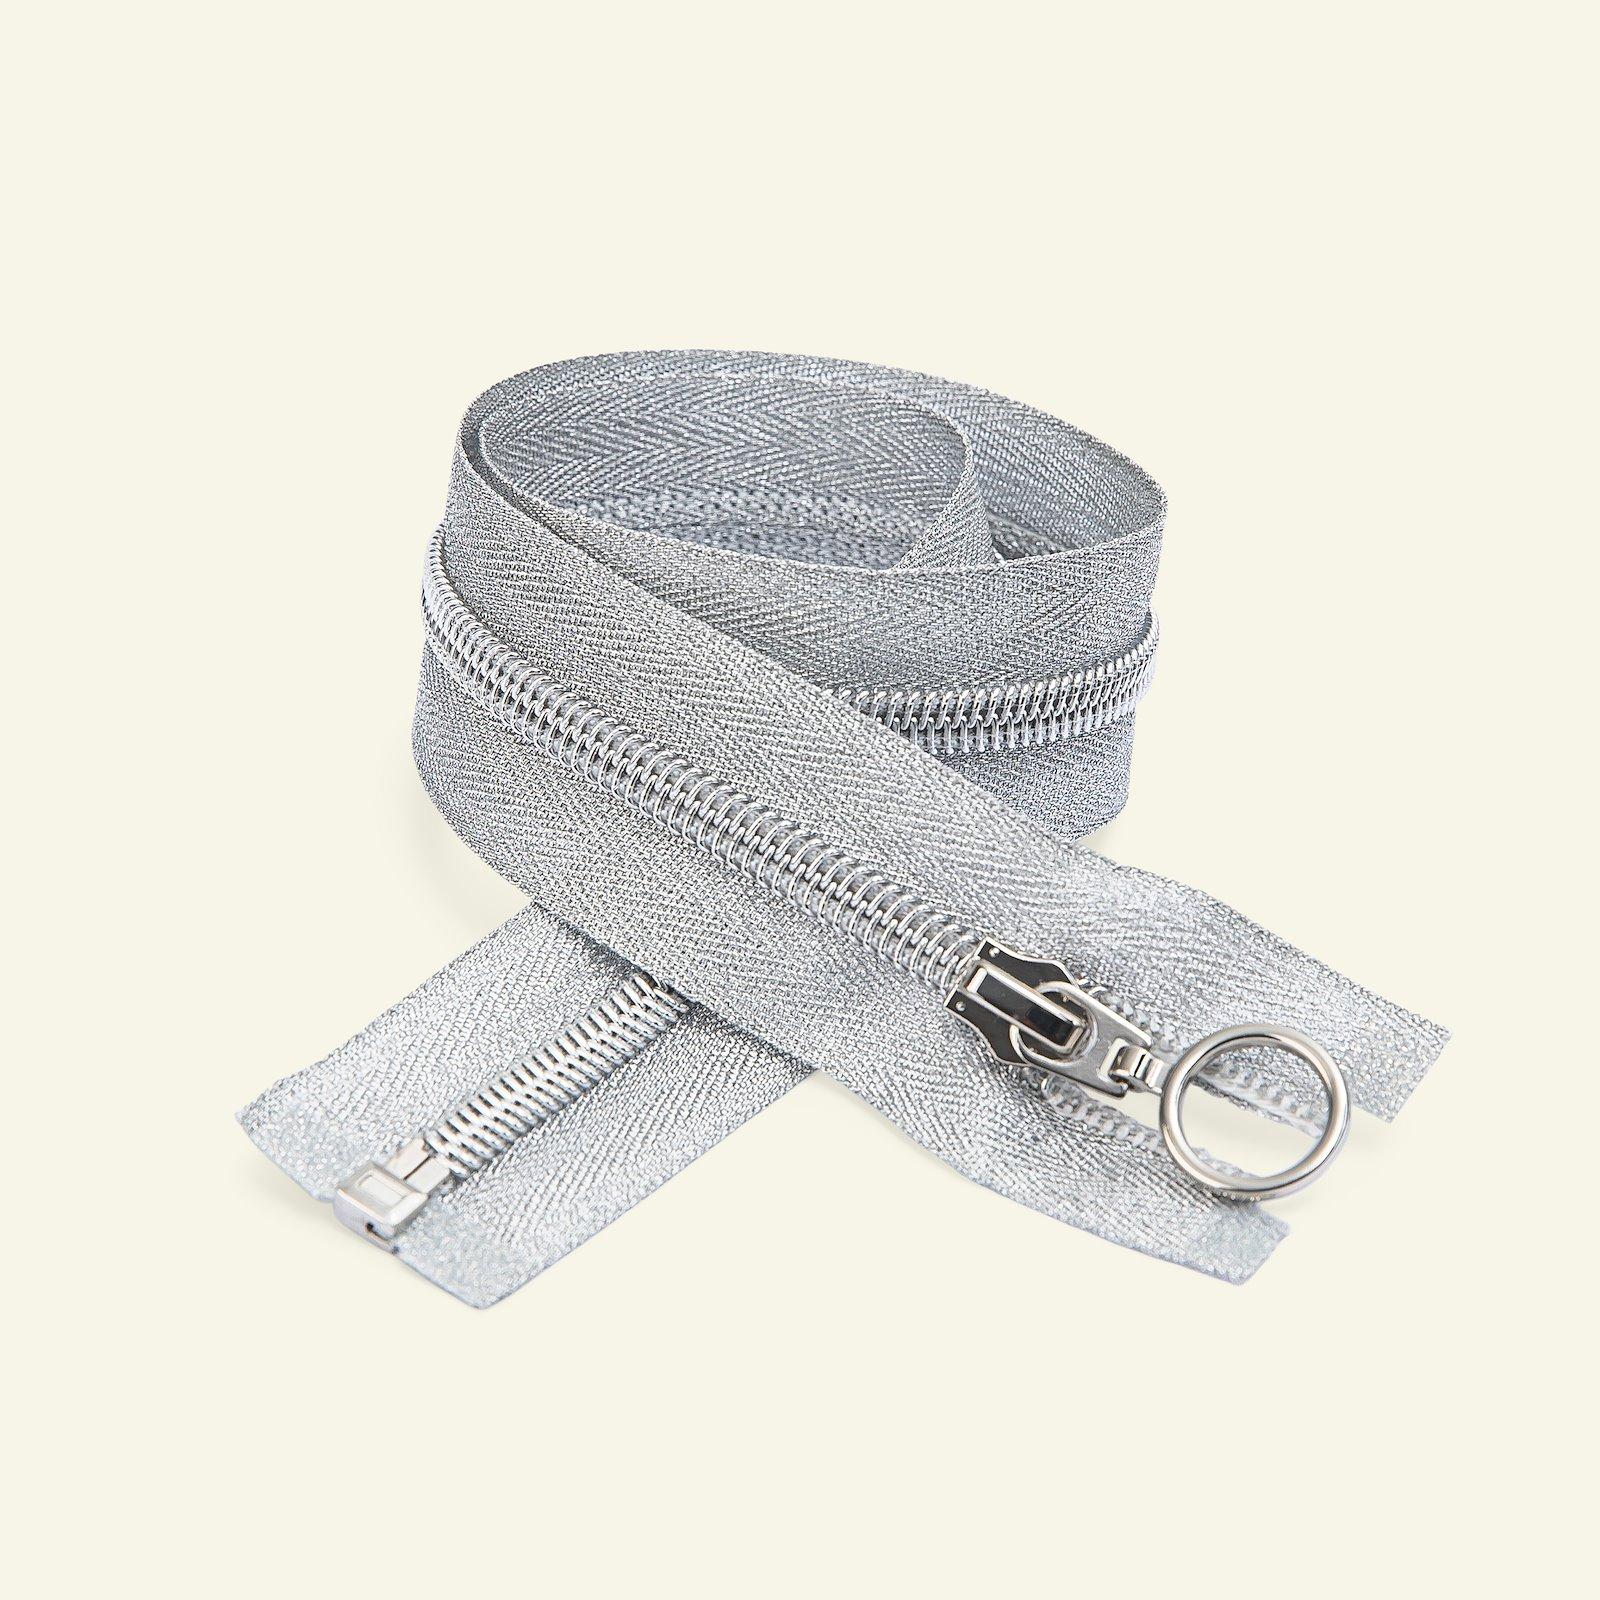 Zip 6mm open end 60cm silver lurex x48080_pack